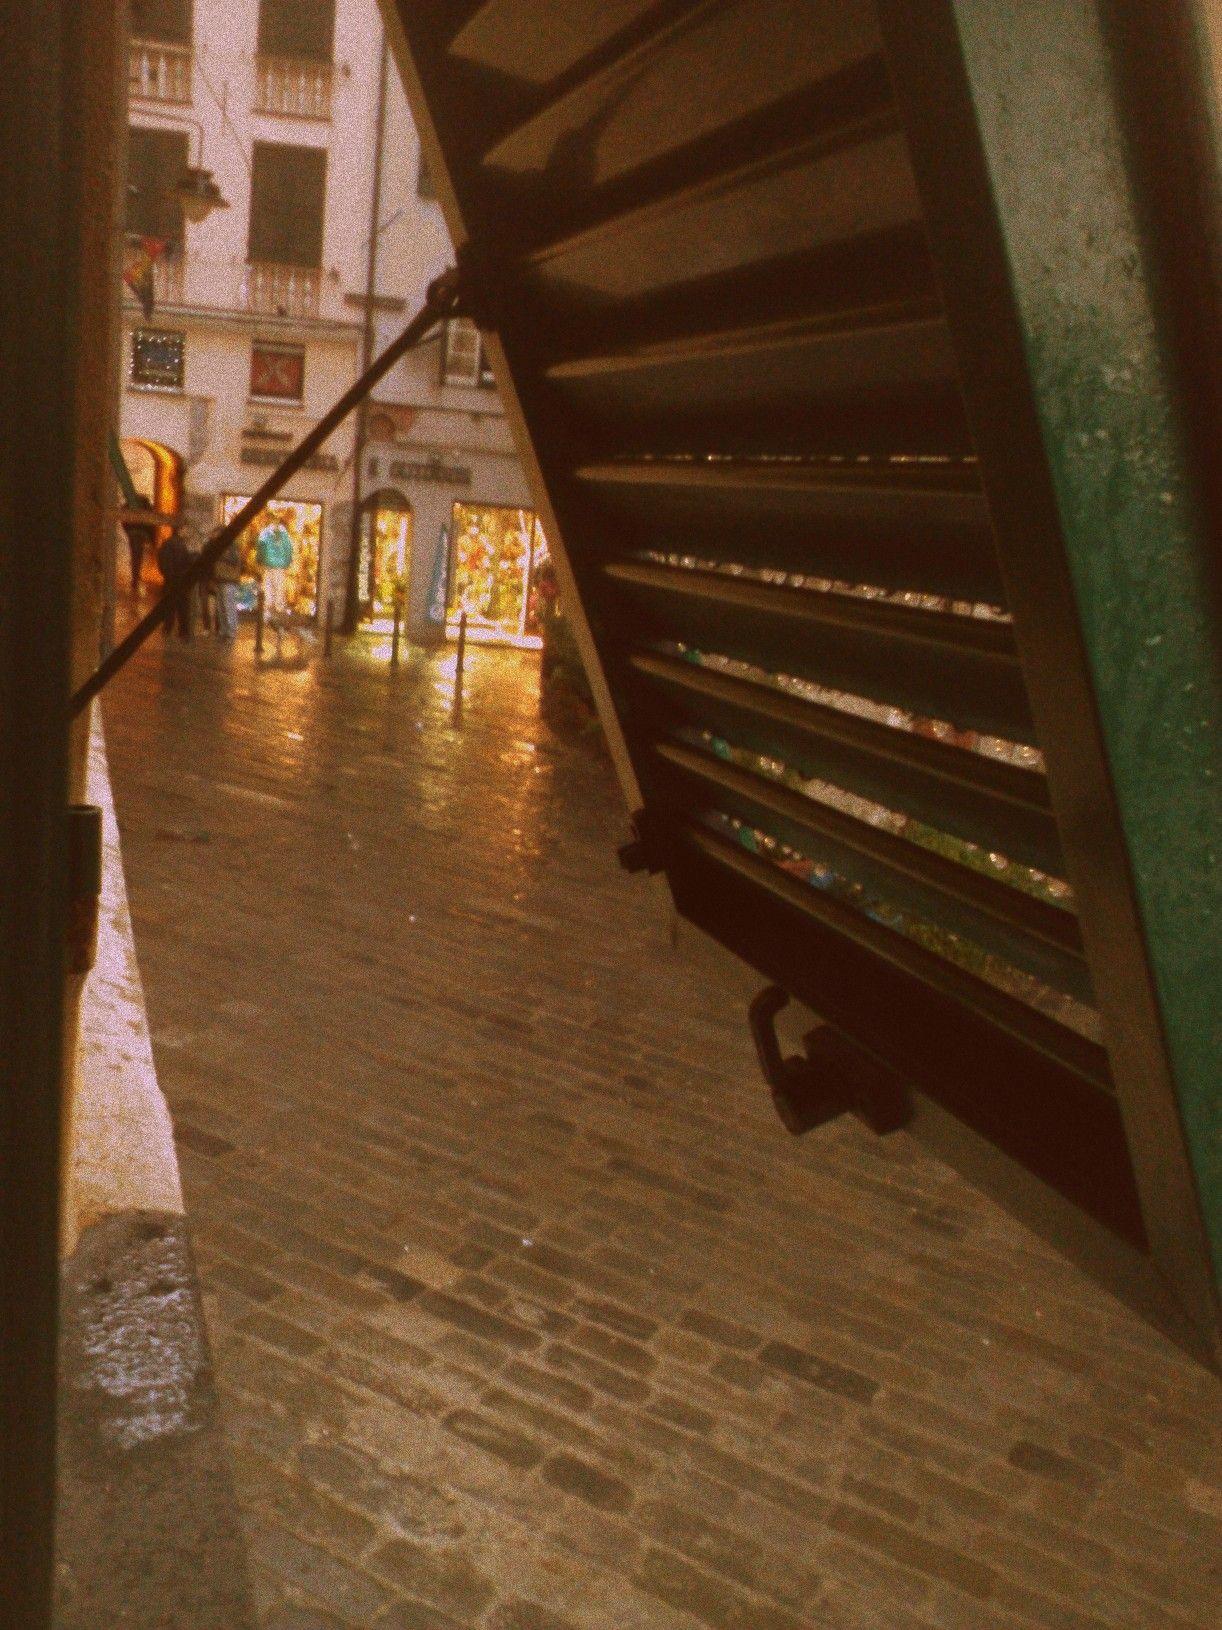 #Genoa #rainyday #uni #exams #gloomyday #oldcenter